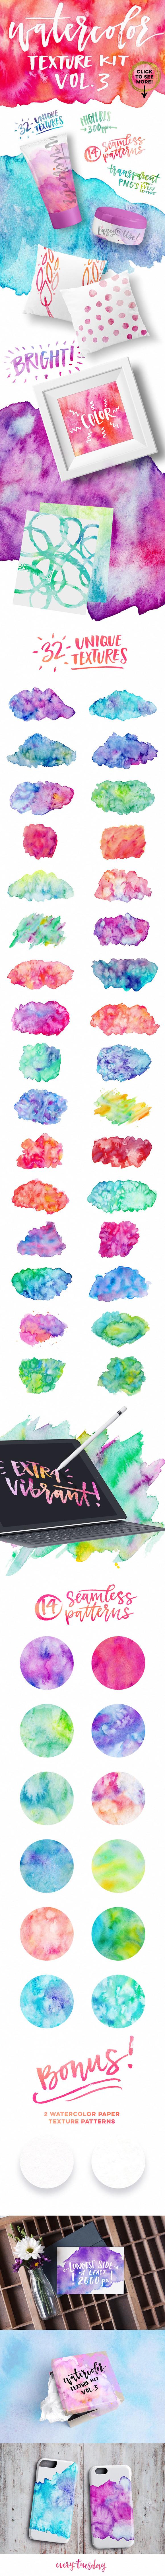 Watercolor Texture Kit Vol. 3 - Textures